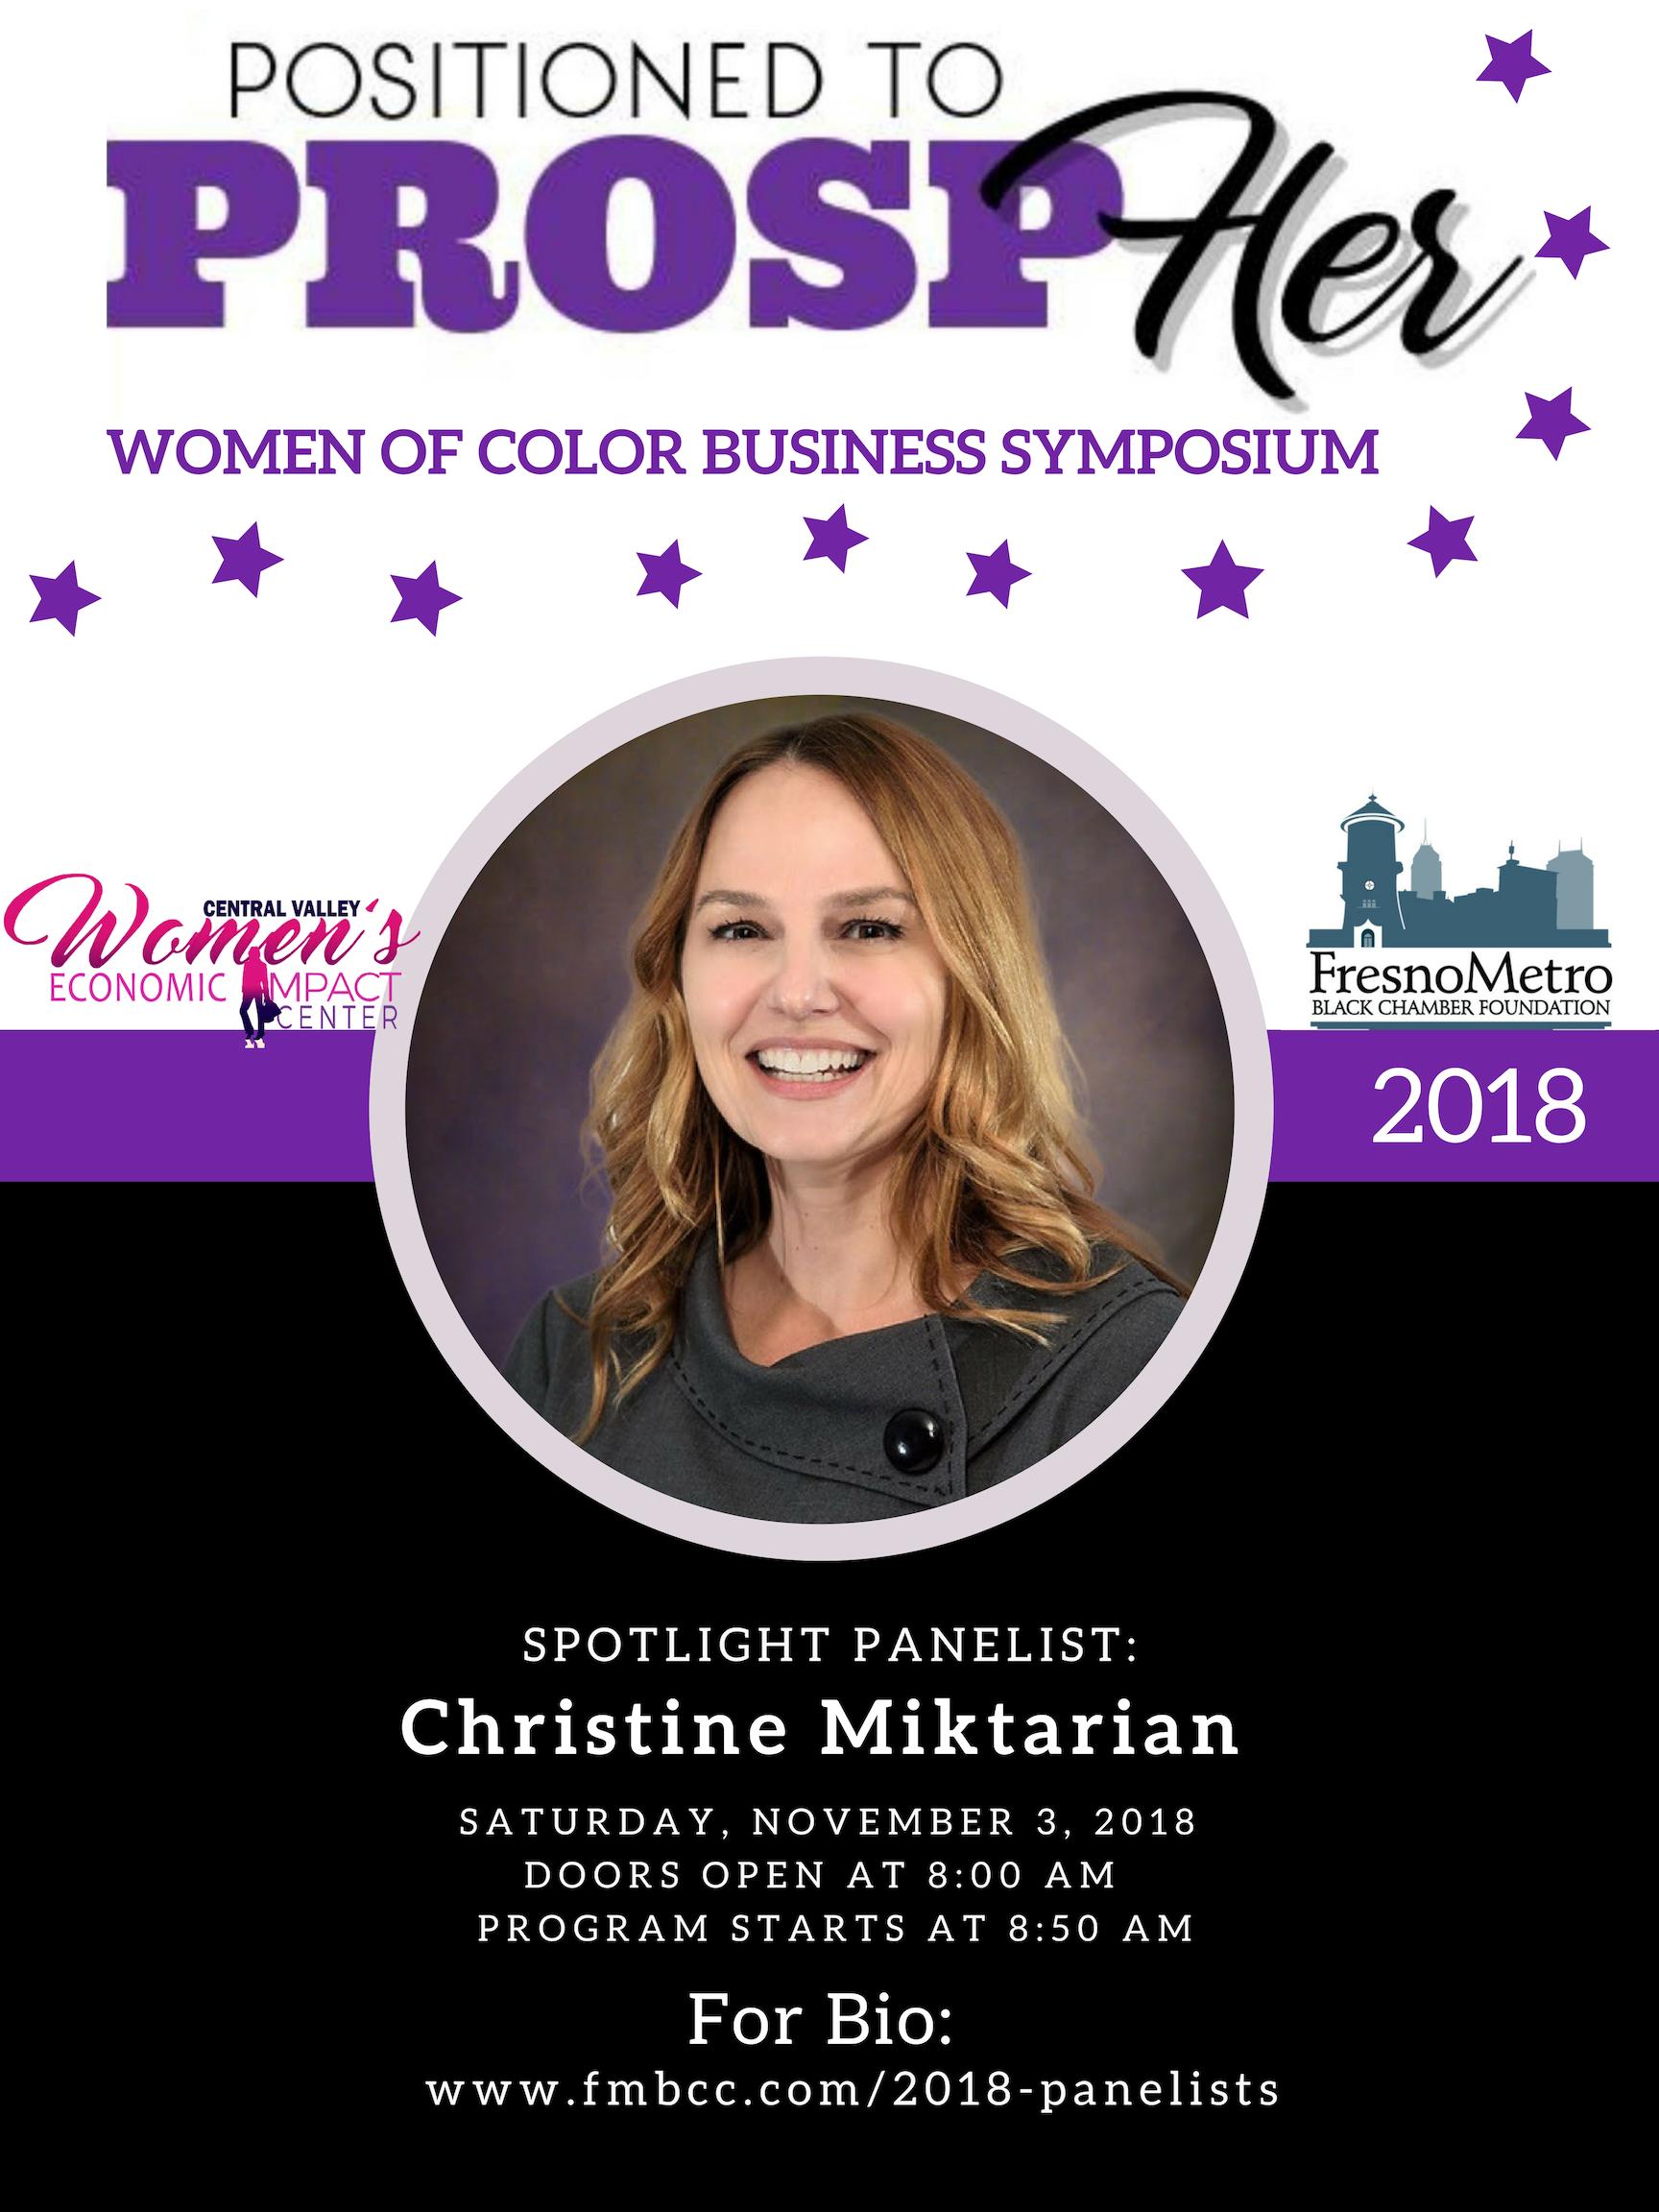 Christine Miktarian